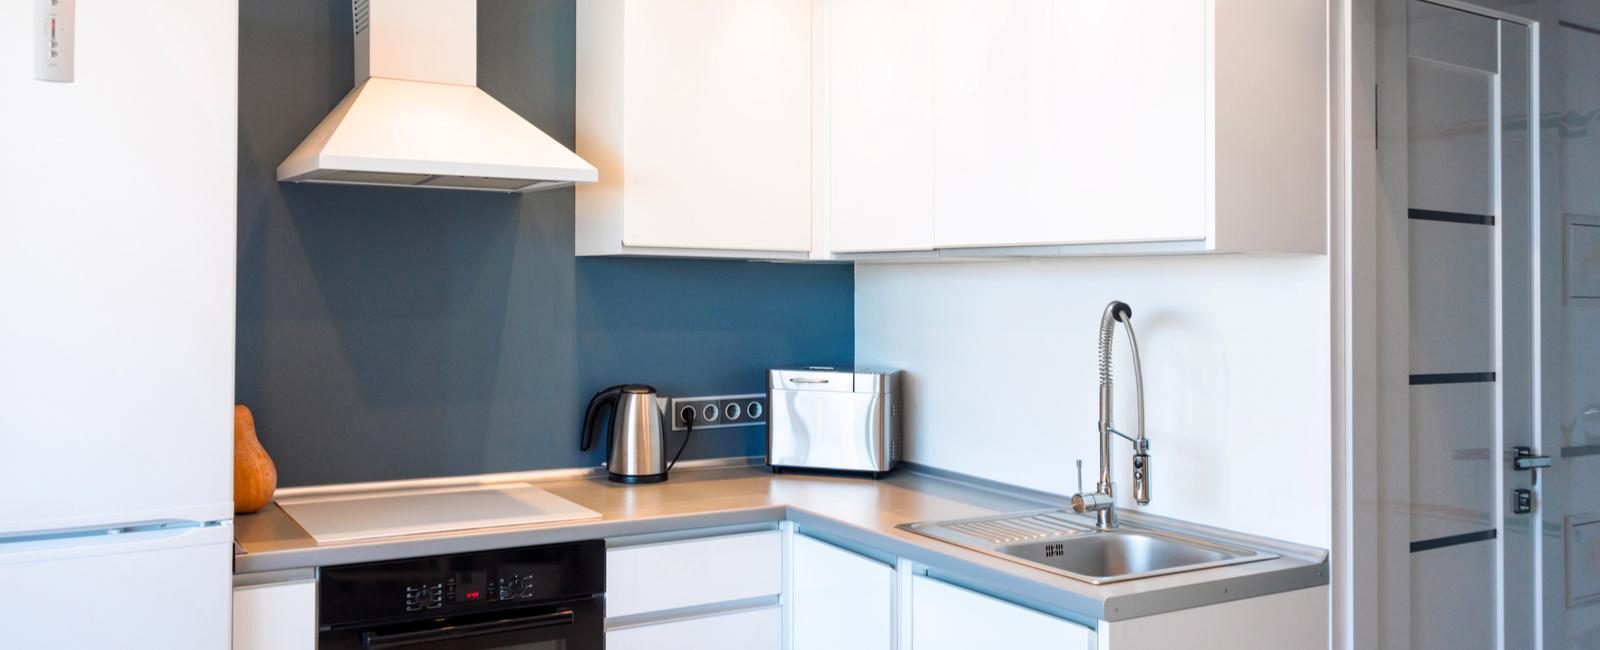 installer robinet de cuisine